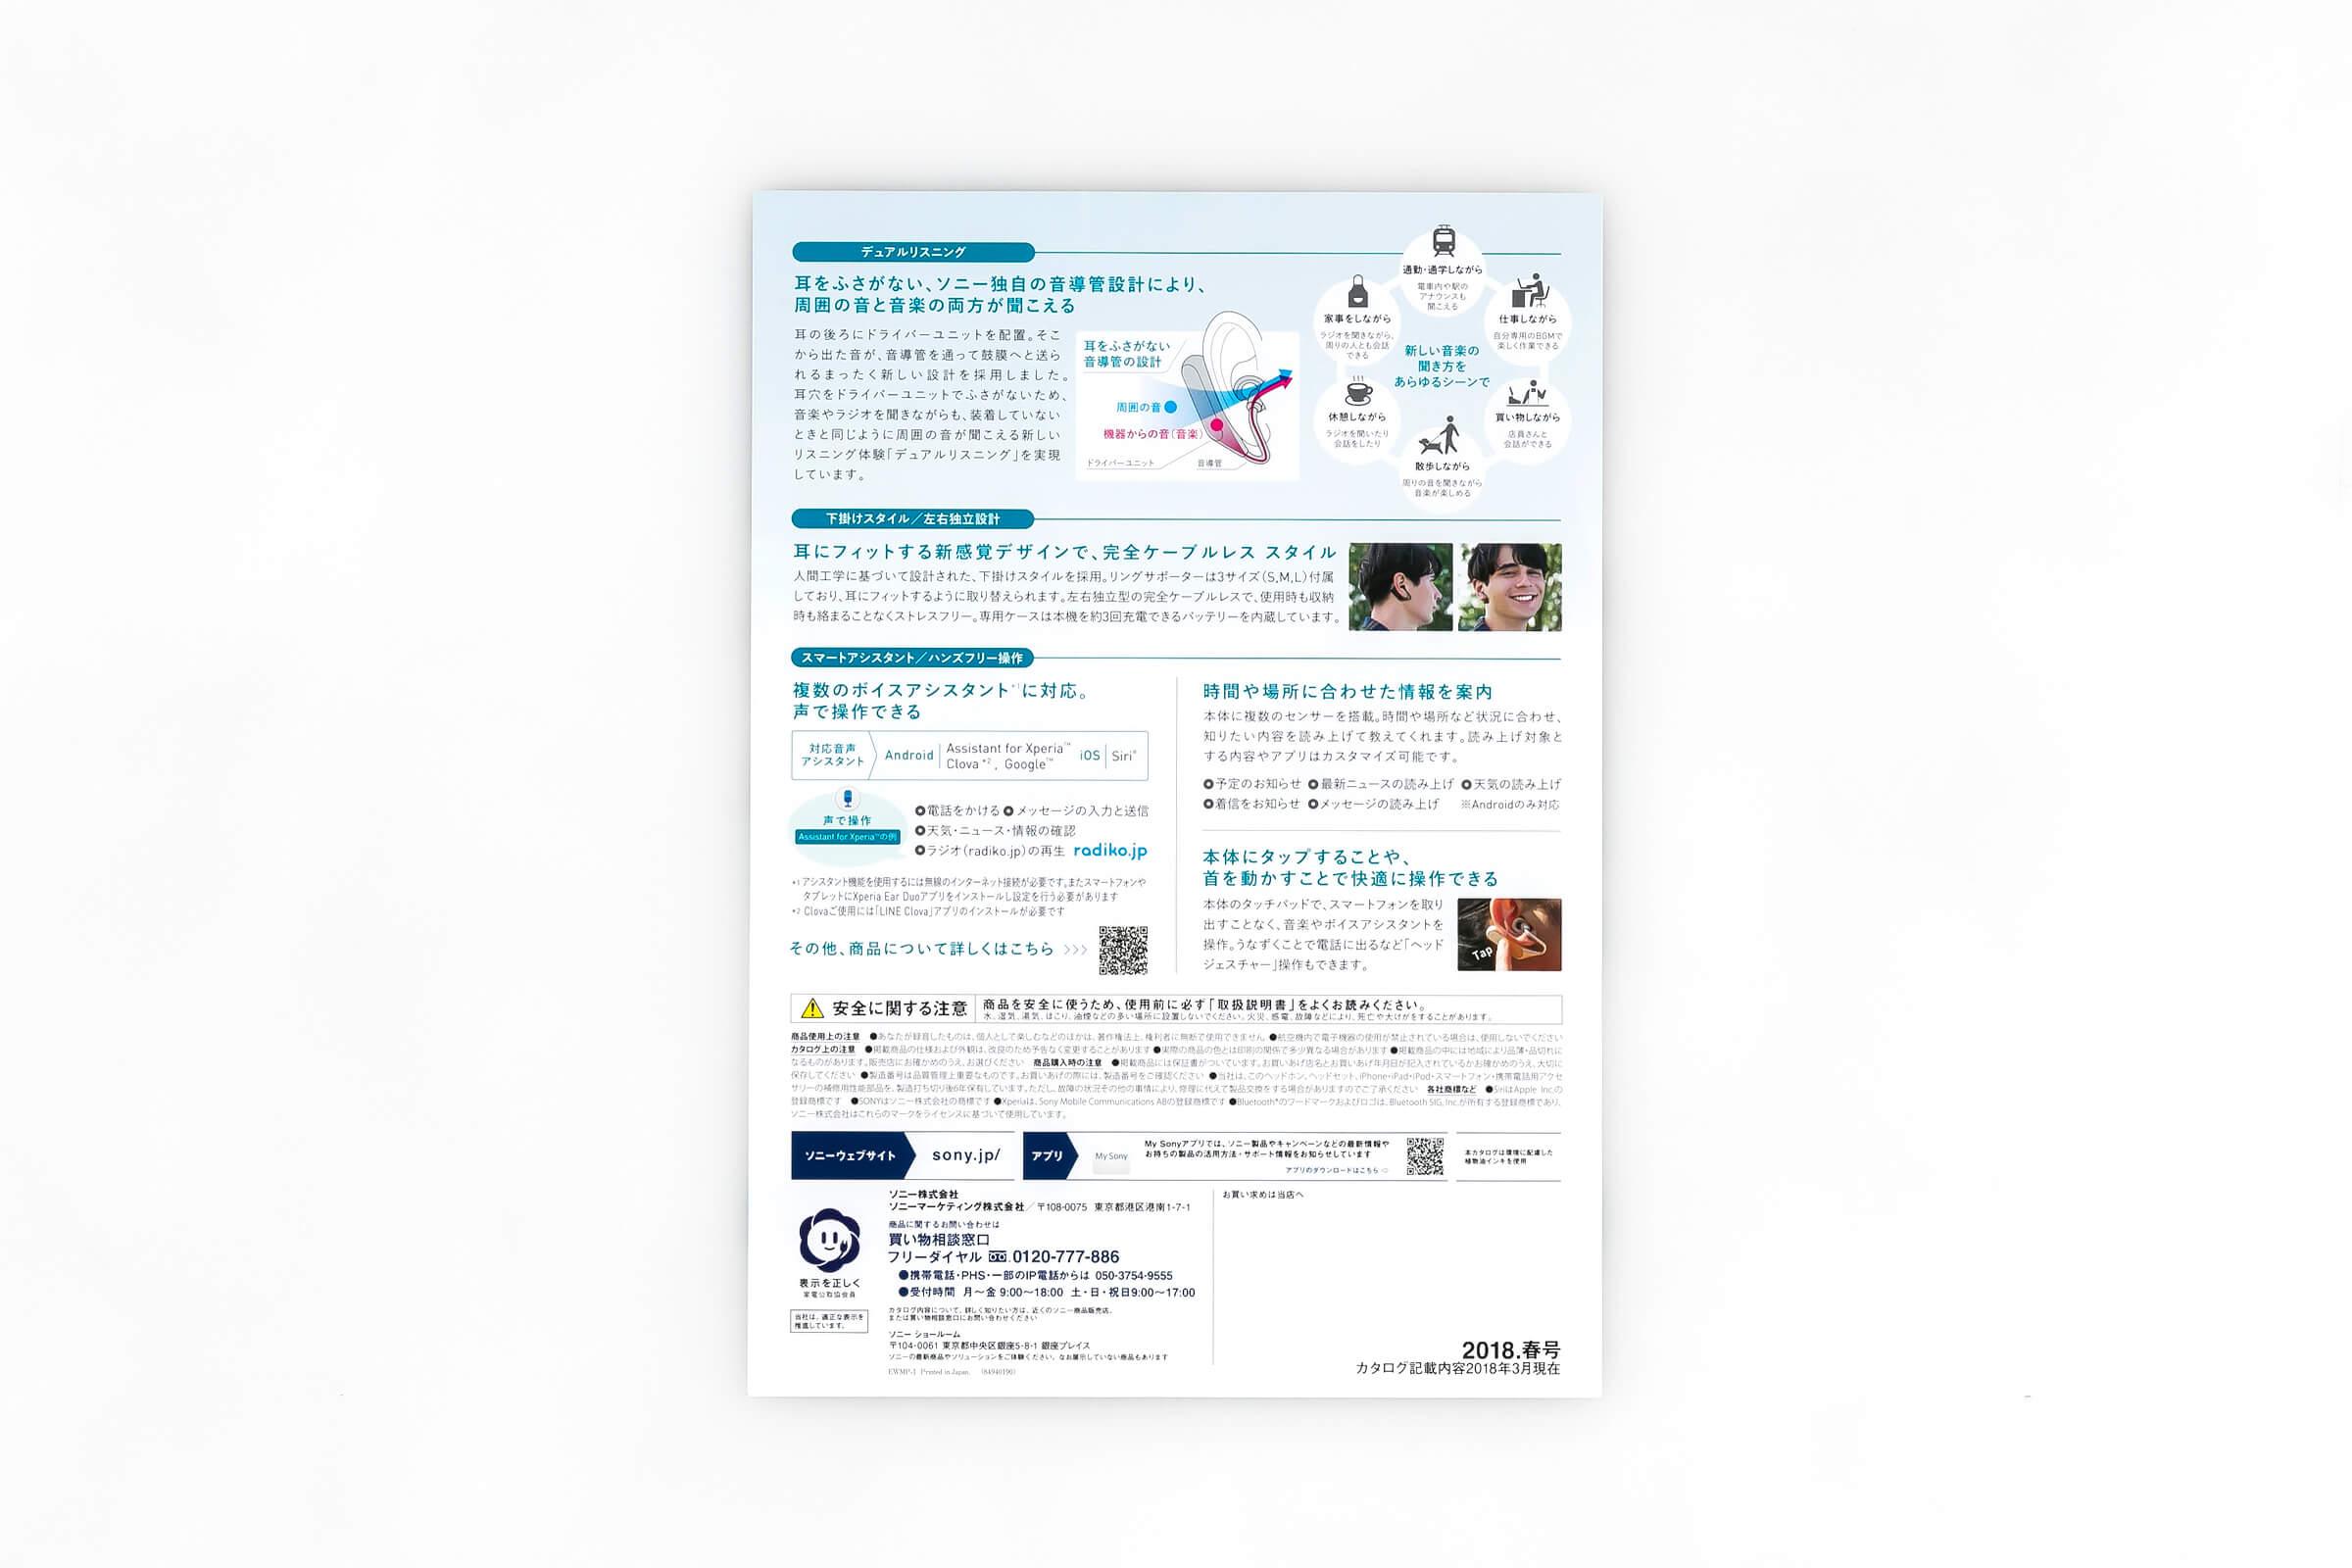 Xperia Ear Duo XEA20 商品カタログ 裏面